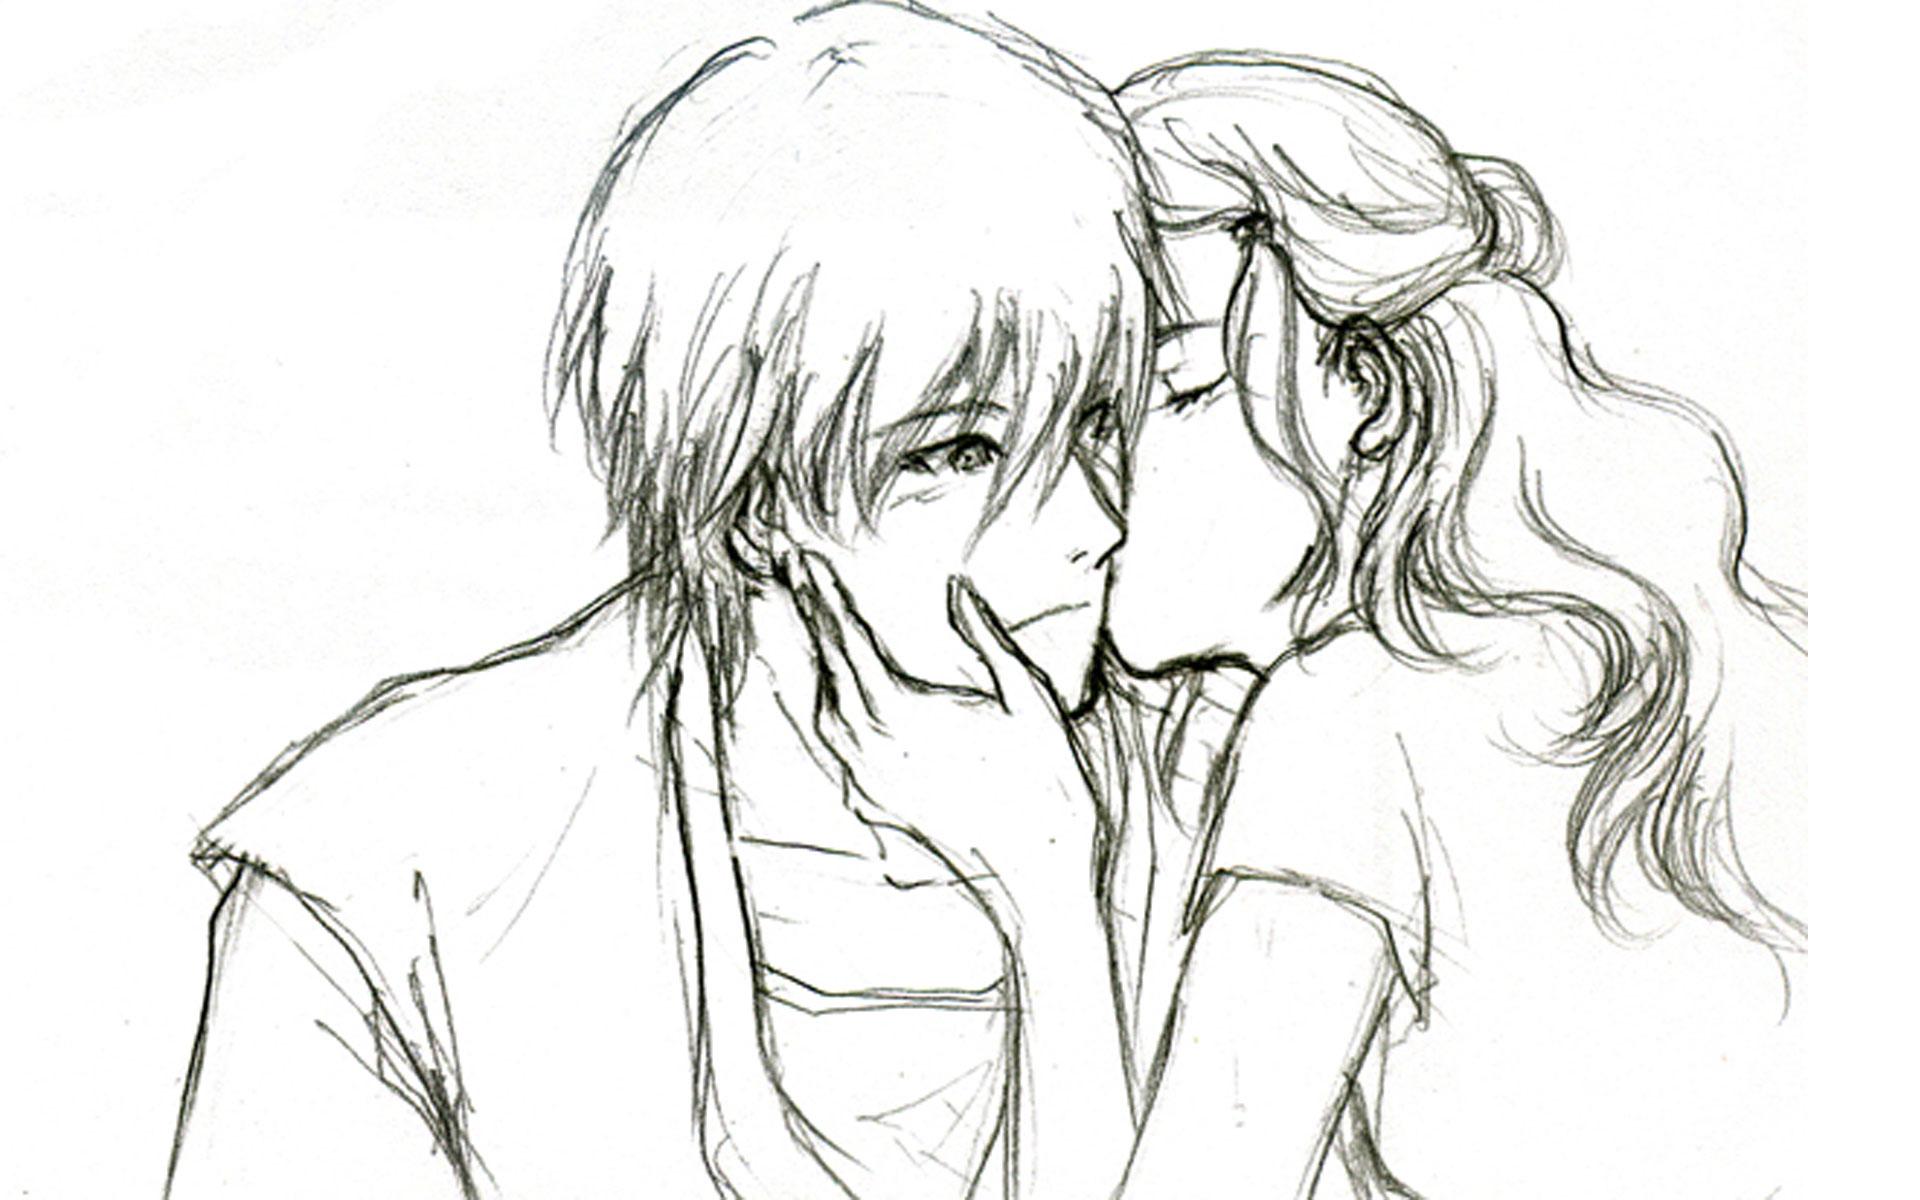 1920x1200 Anime Love Drawing Love Cute Sketch Cute Love Drawings View Cute